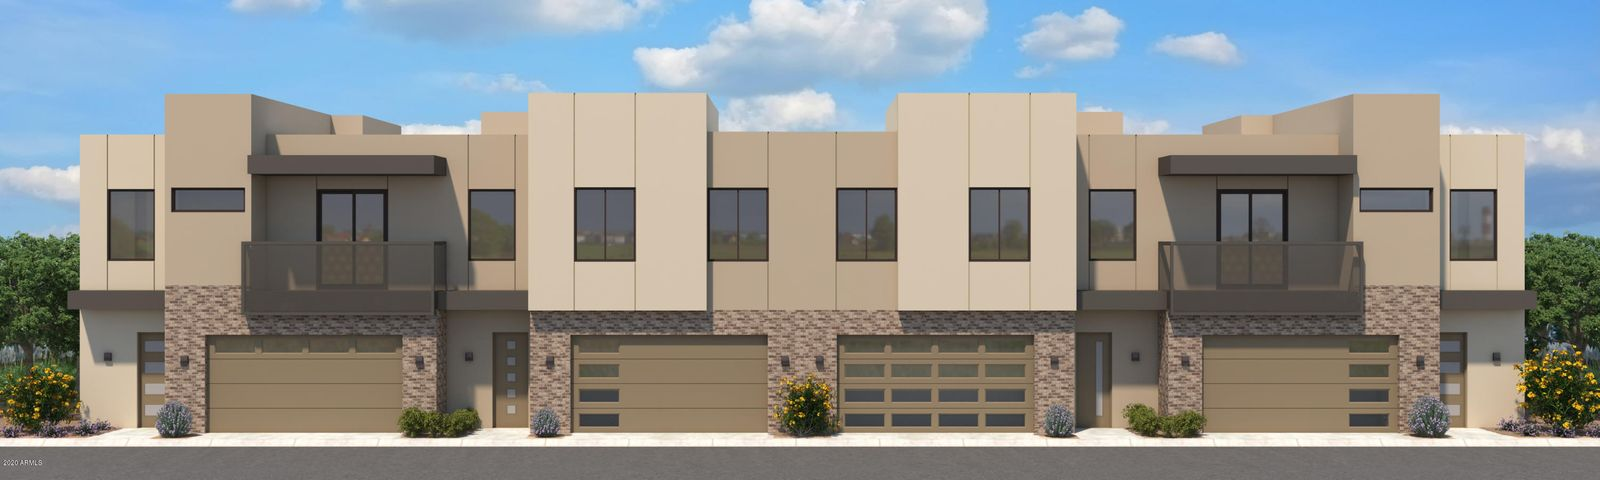 901 S Smith Road, 1048, Tempe, AZ 85281